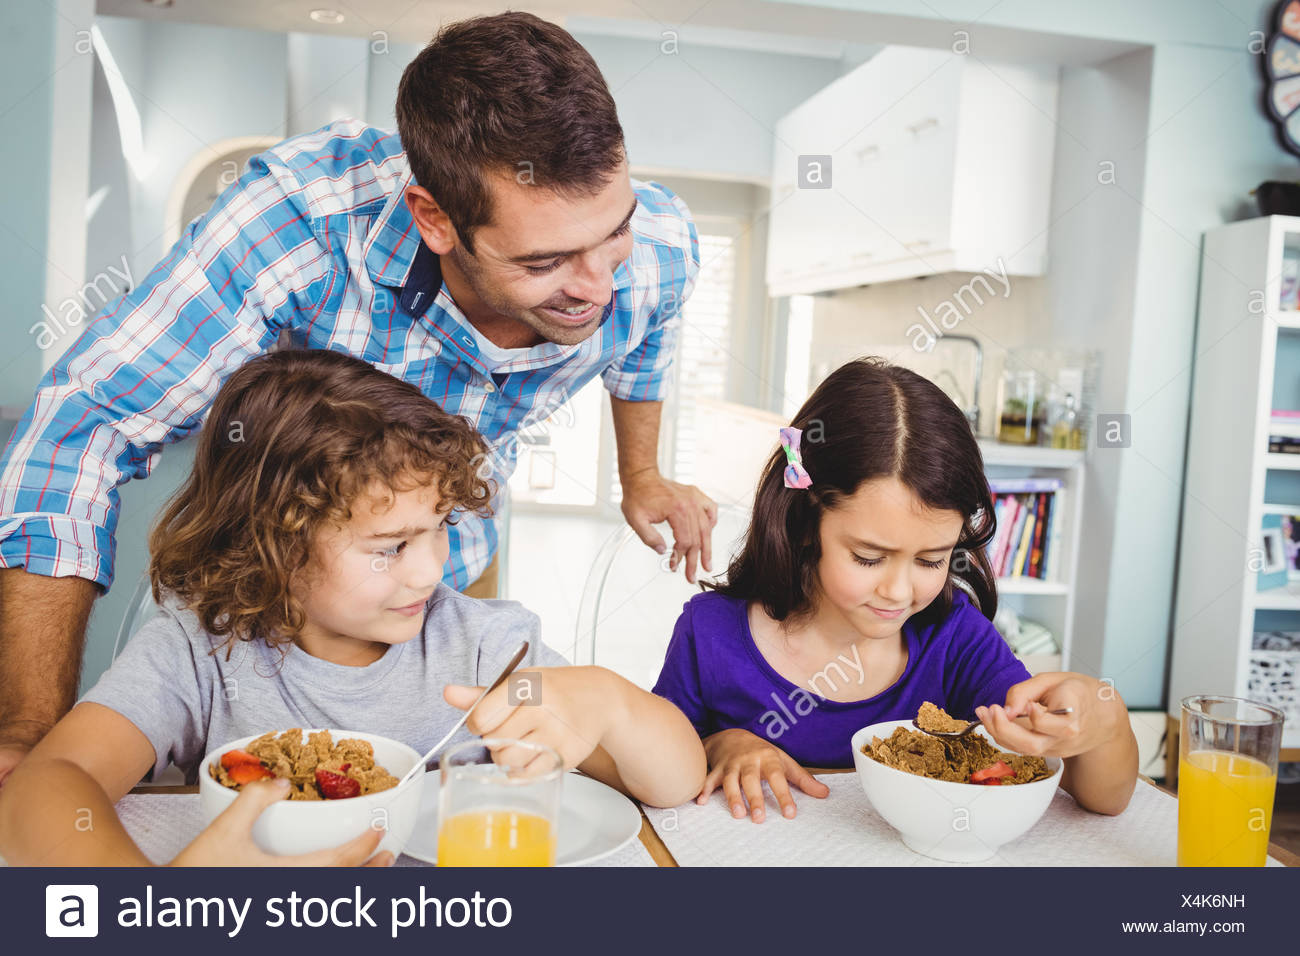 Cheerful man with children having breakfast - Stock Image